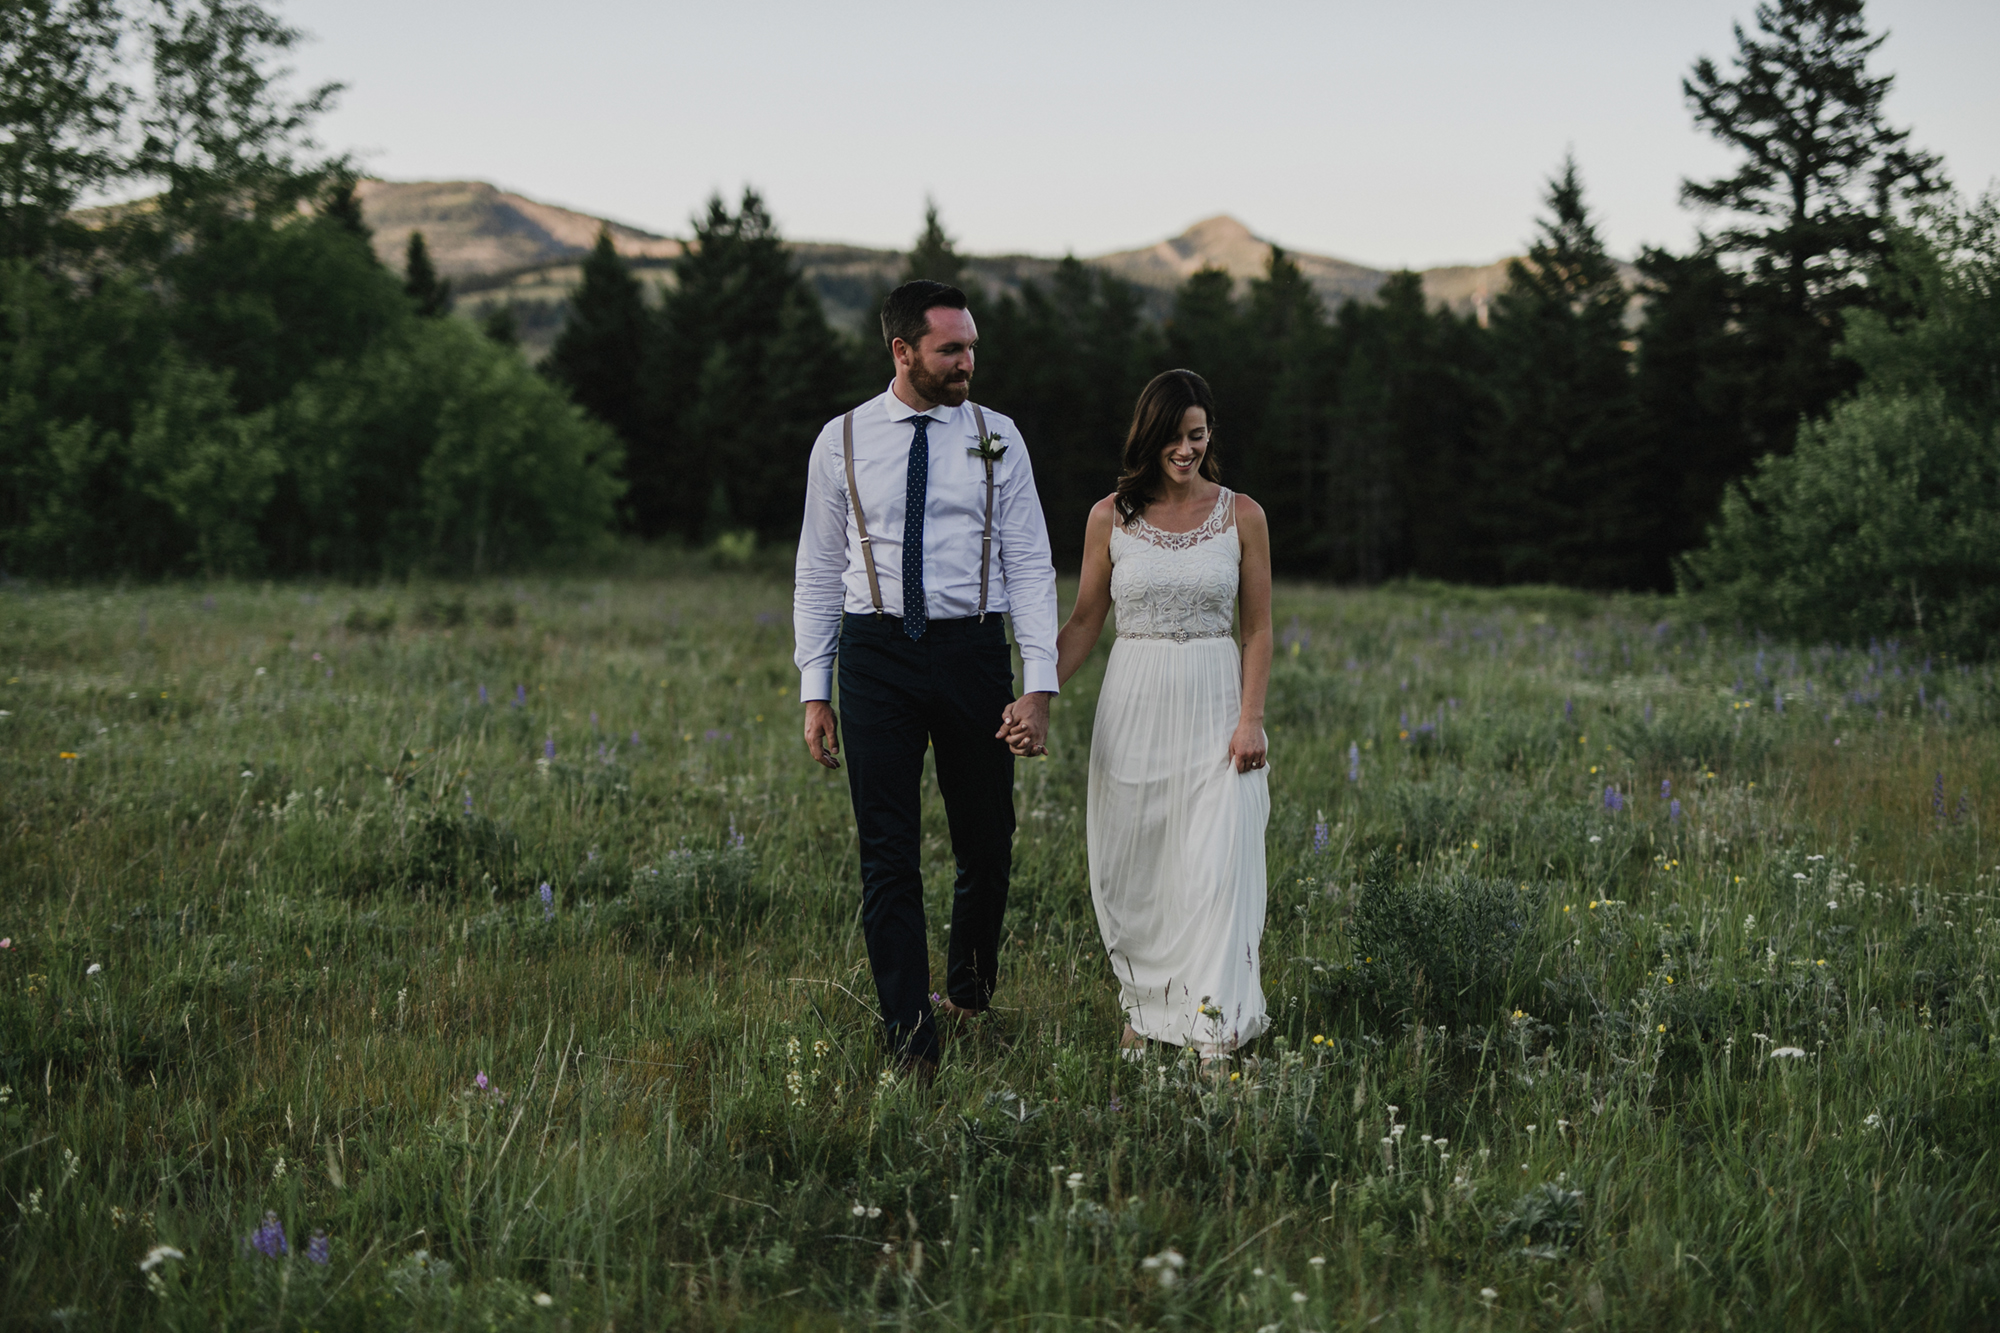 Flower Farm Crowsnest Pass Wedding -091.JPG